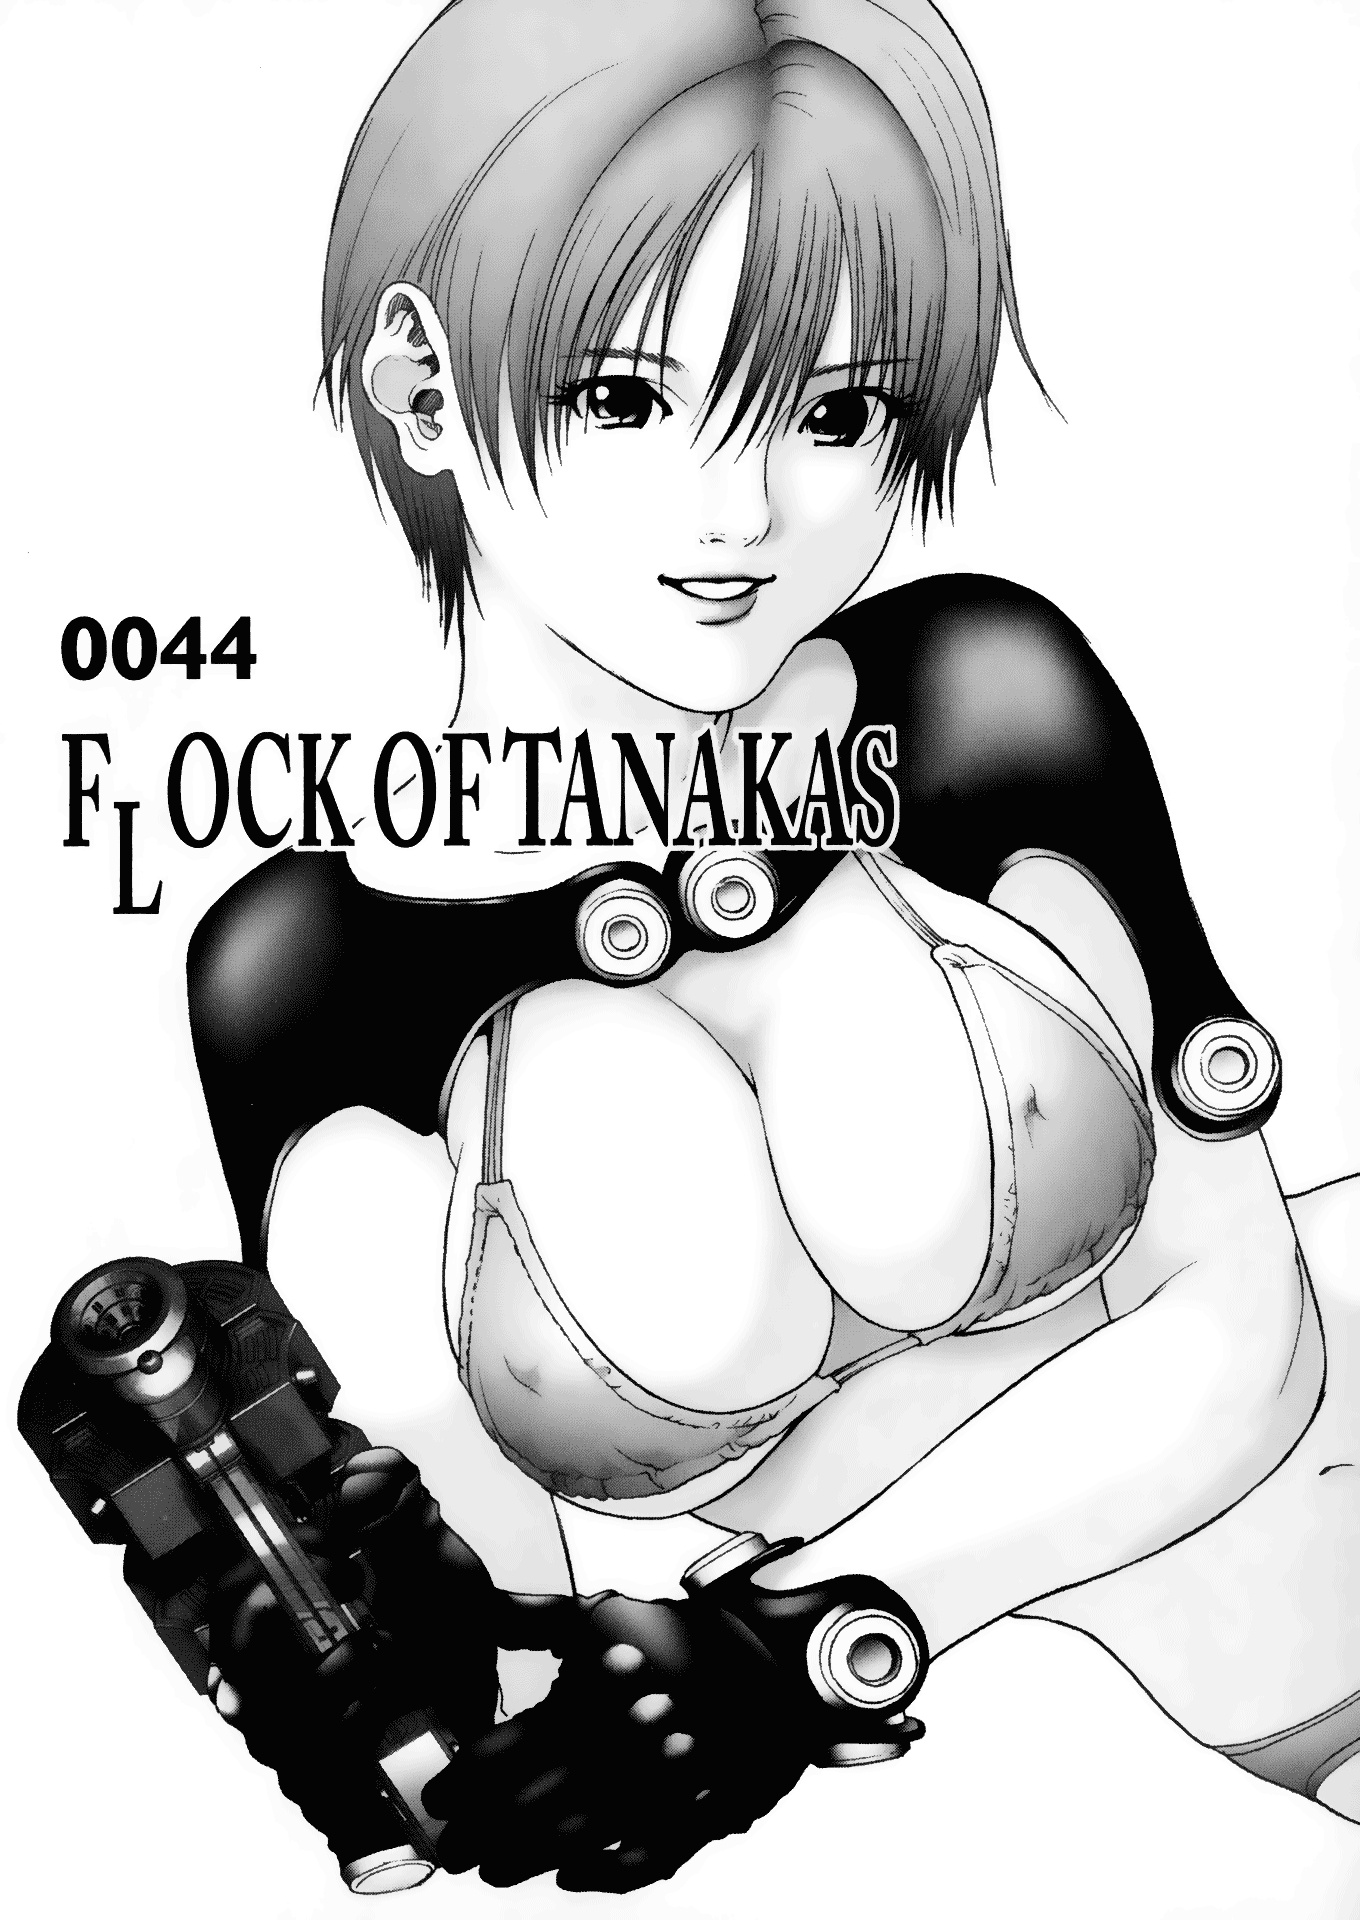 what chapter of gantz has sex